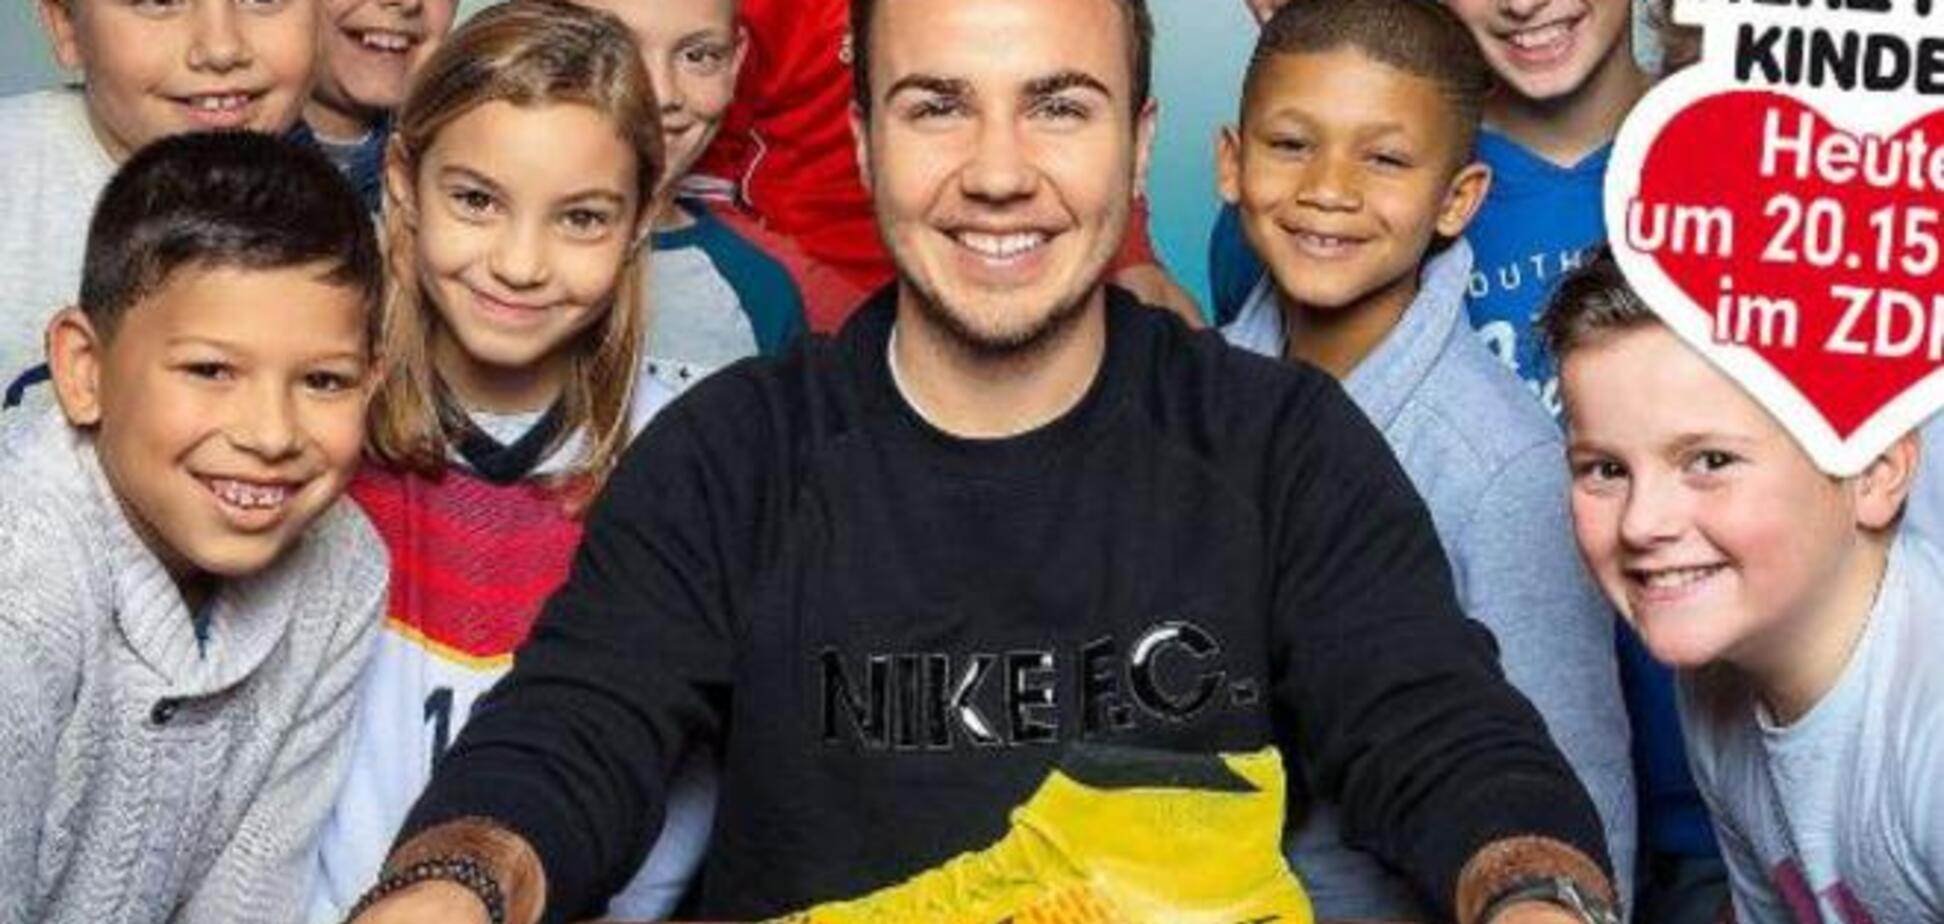 Немецкий футболист продал свой 'ботинок' за 2 млн евро